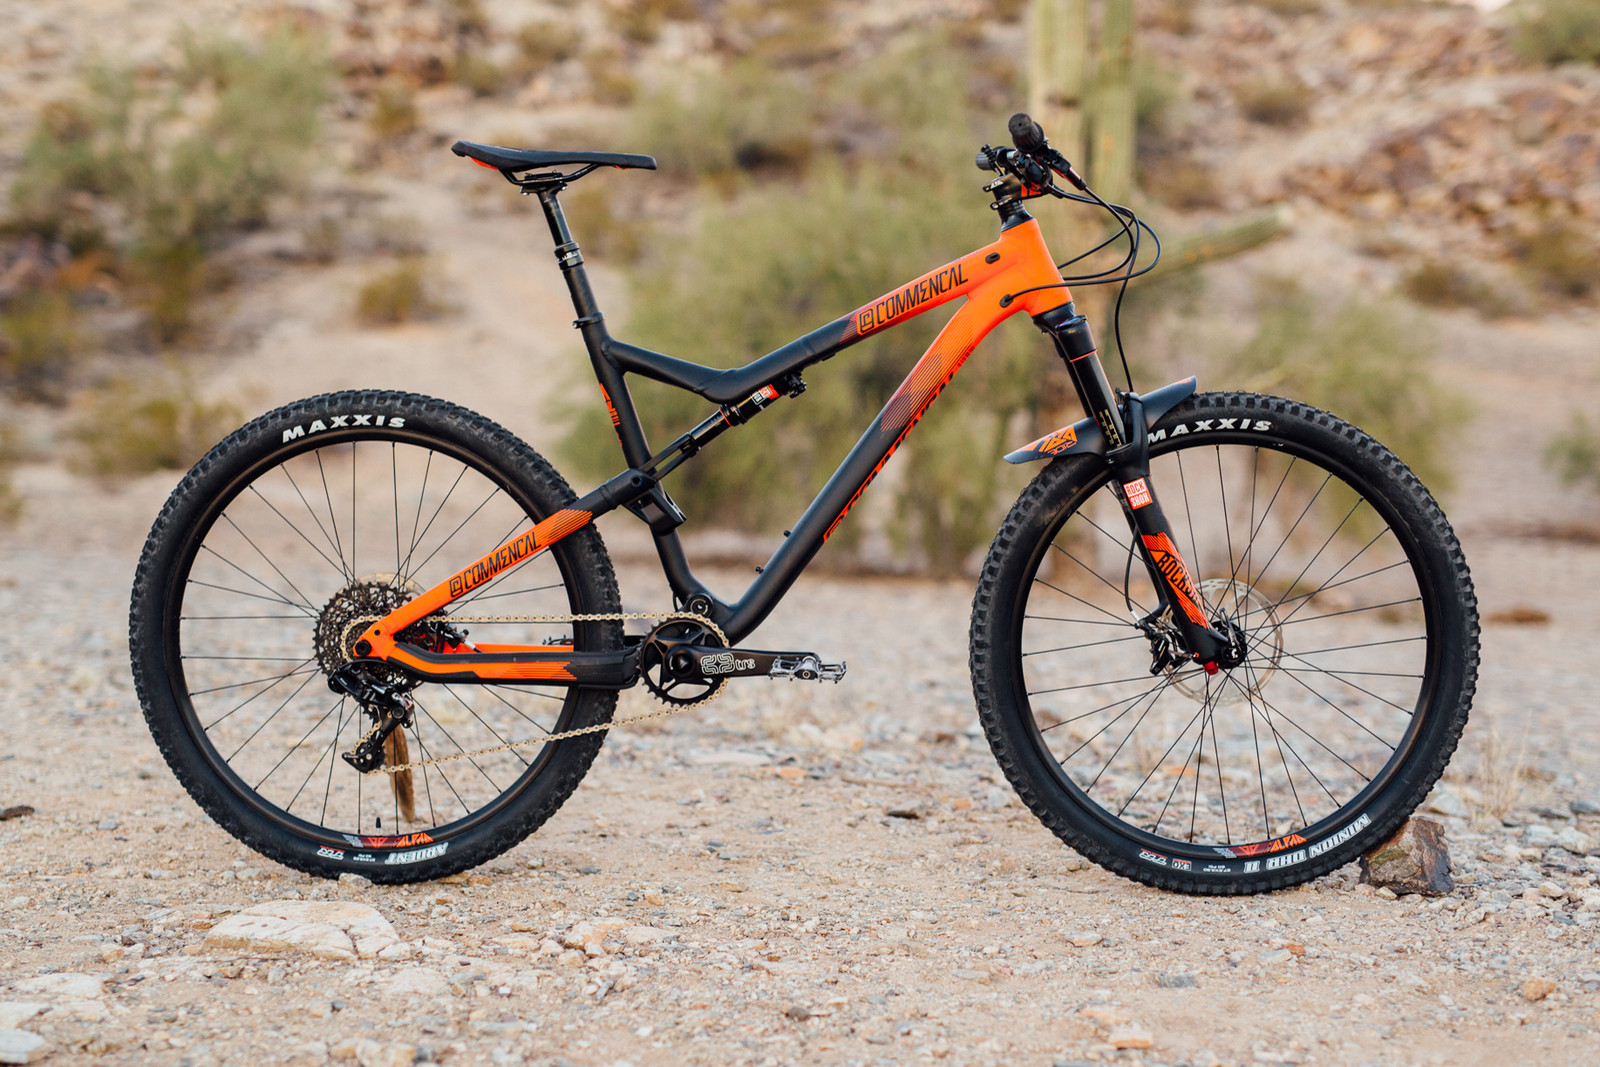 2016 Commencal Meta Trail 650B - 17 Bikes Tested - 2016 Vital MTB Test Sessions - Mountain Biking Pictures - Vital MTB